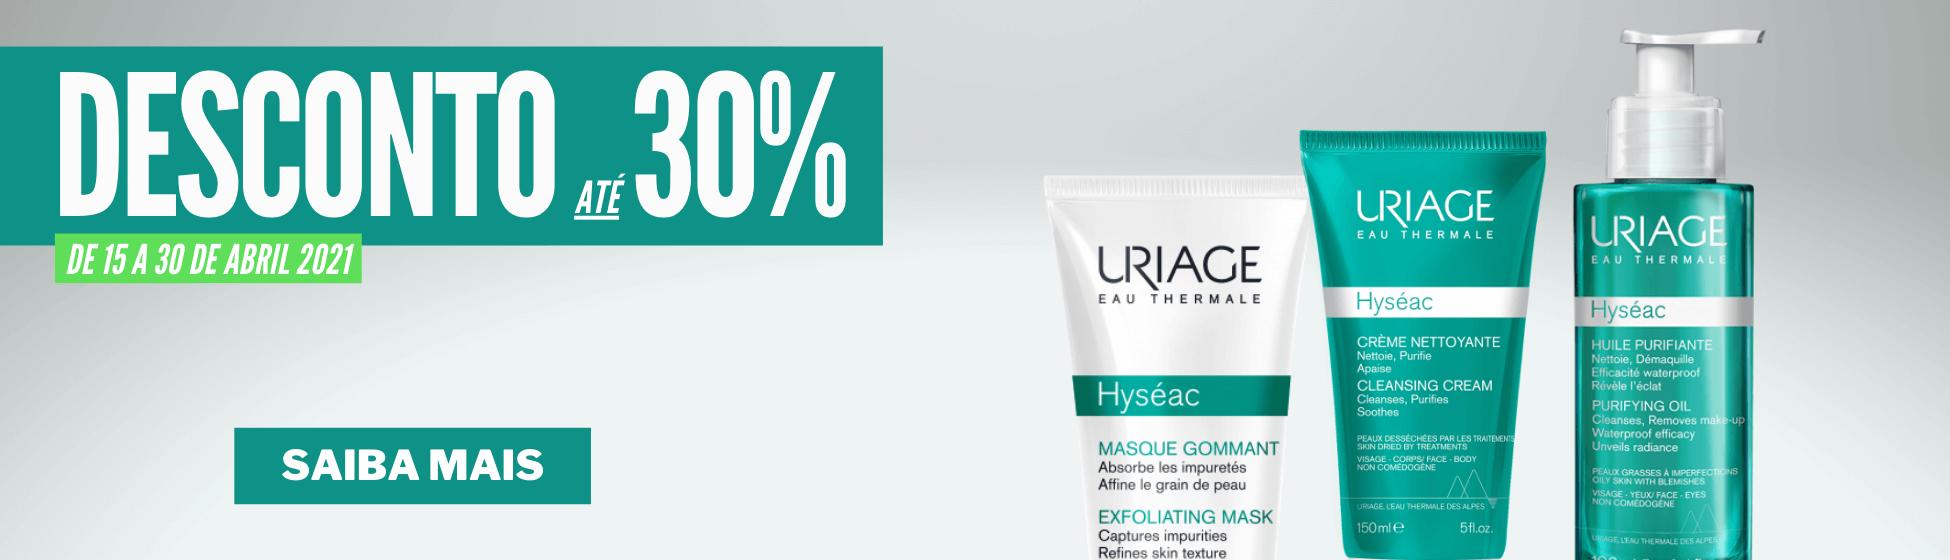 Uriage-Portugal-Promocao-abril (1)